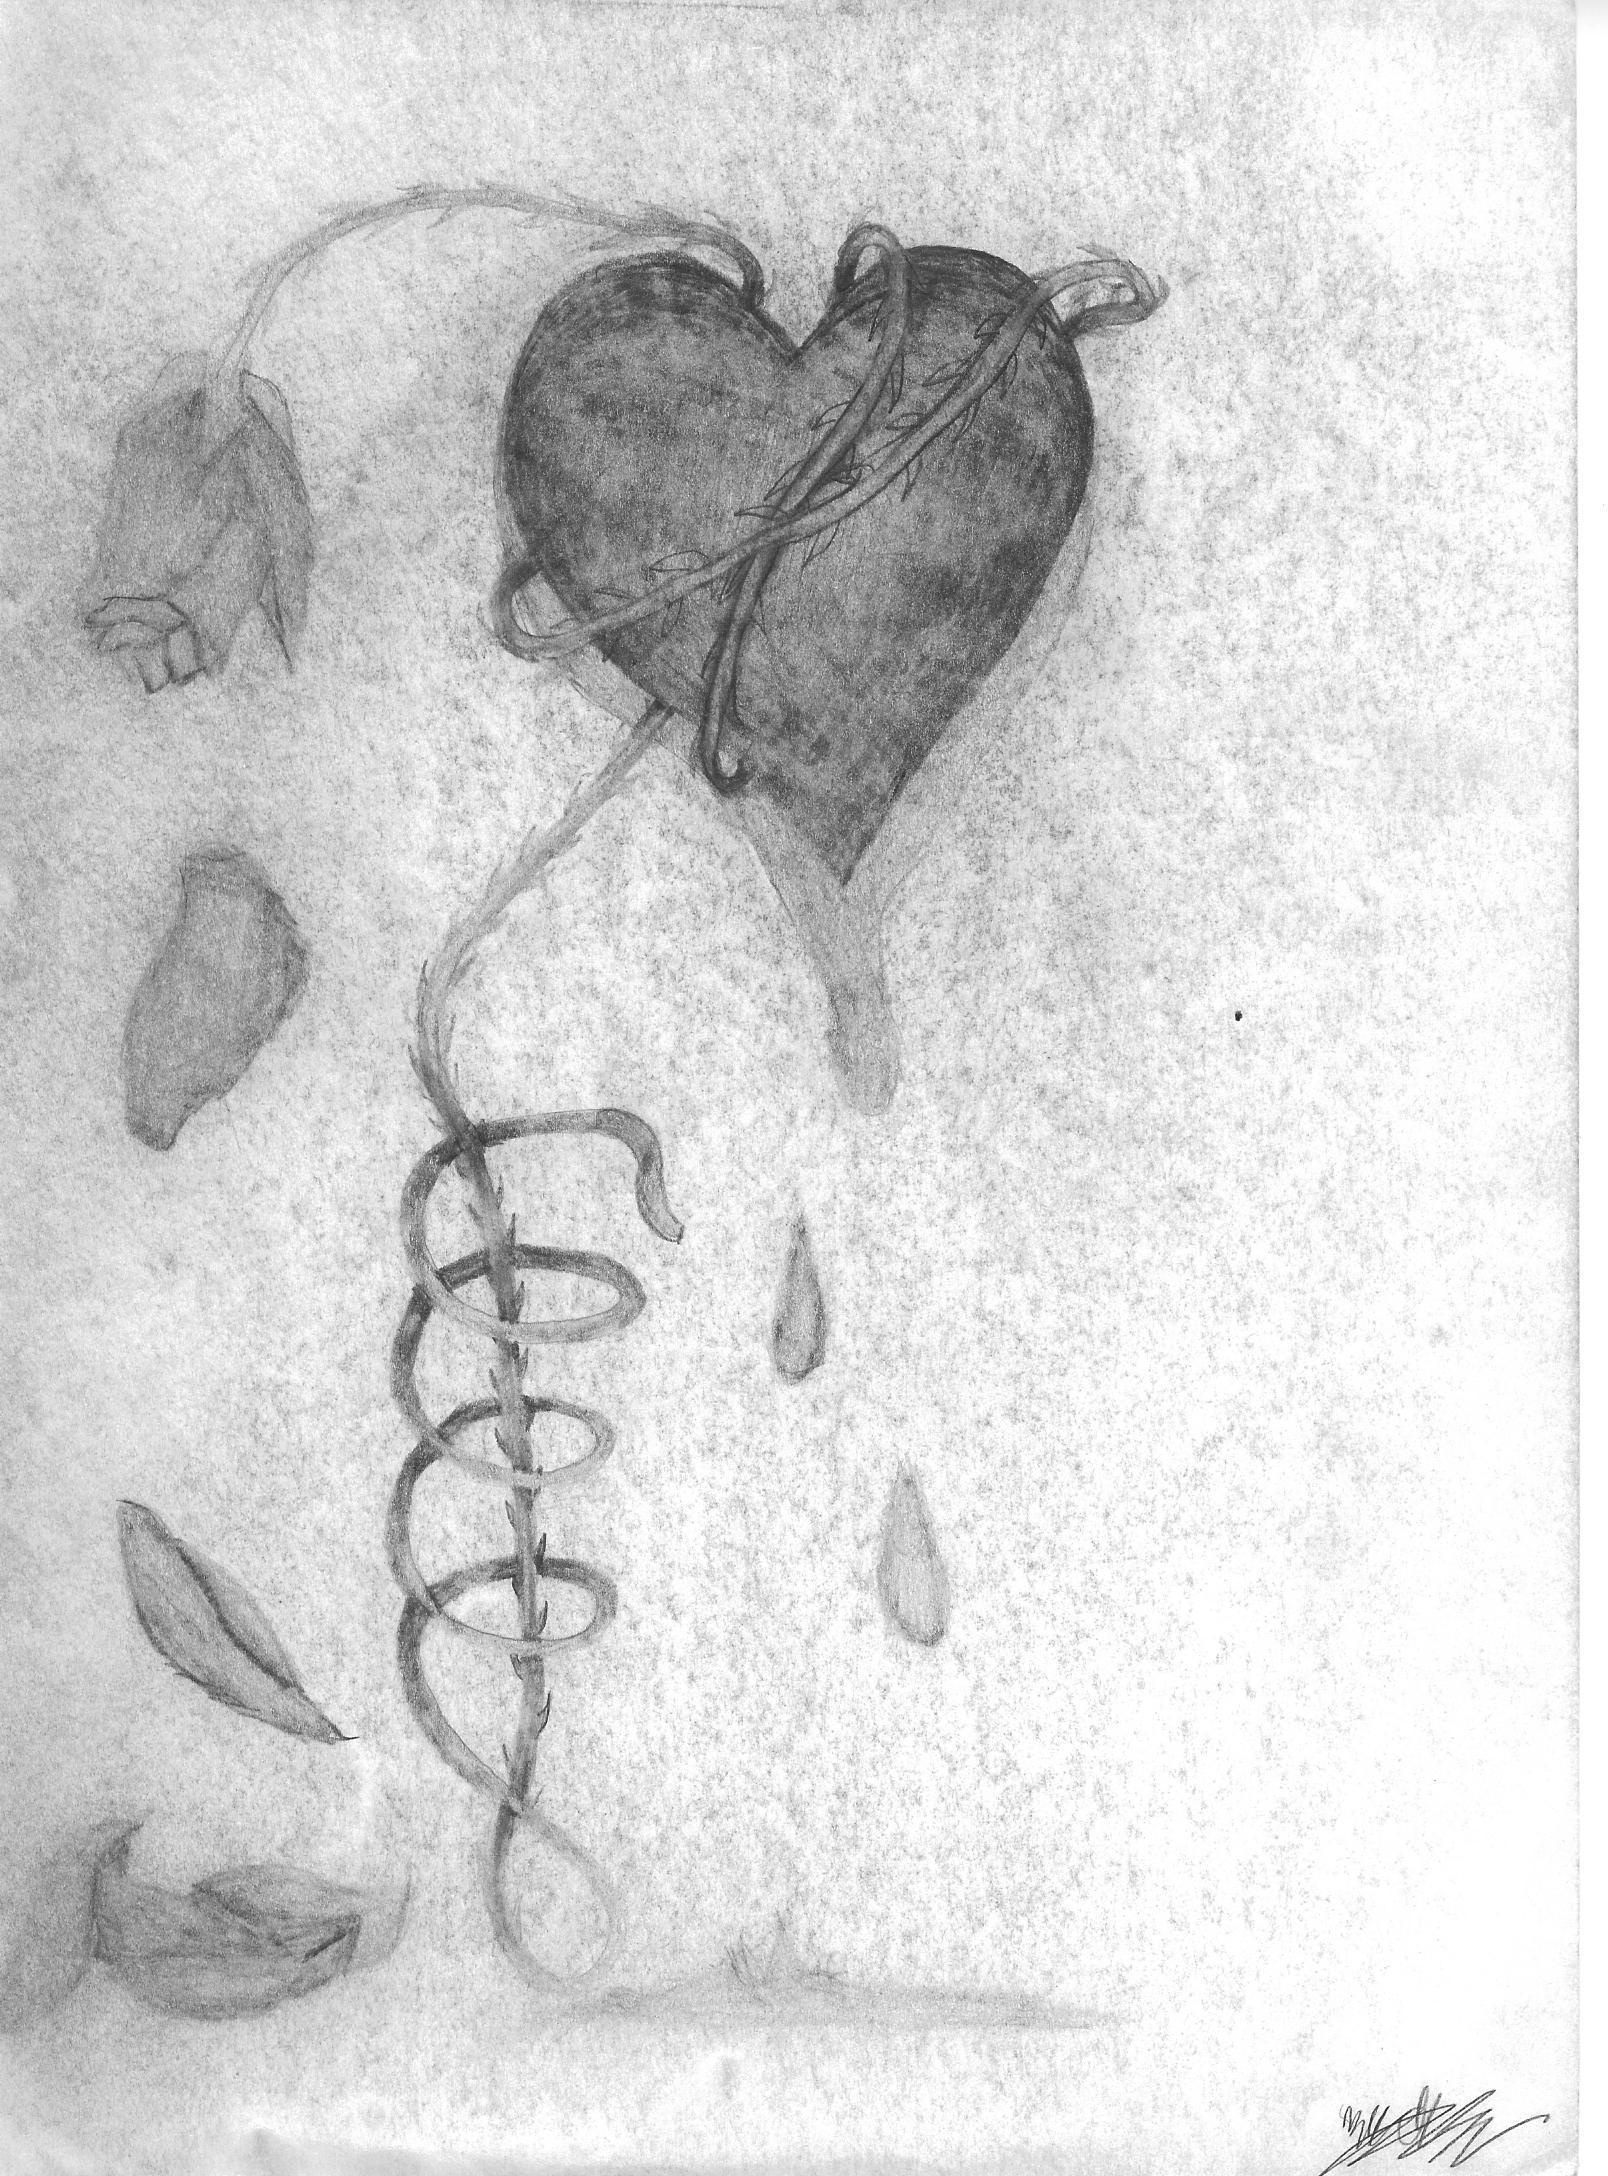 Bleeding Heart Sketch Bleeding Heart of Thorns